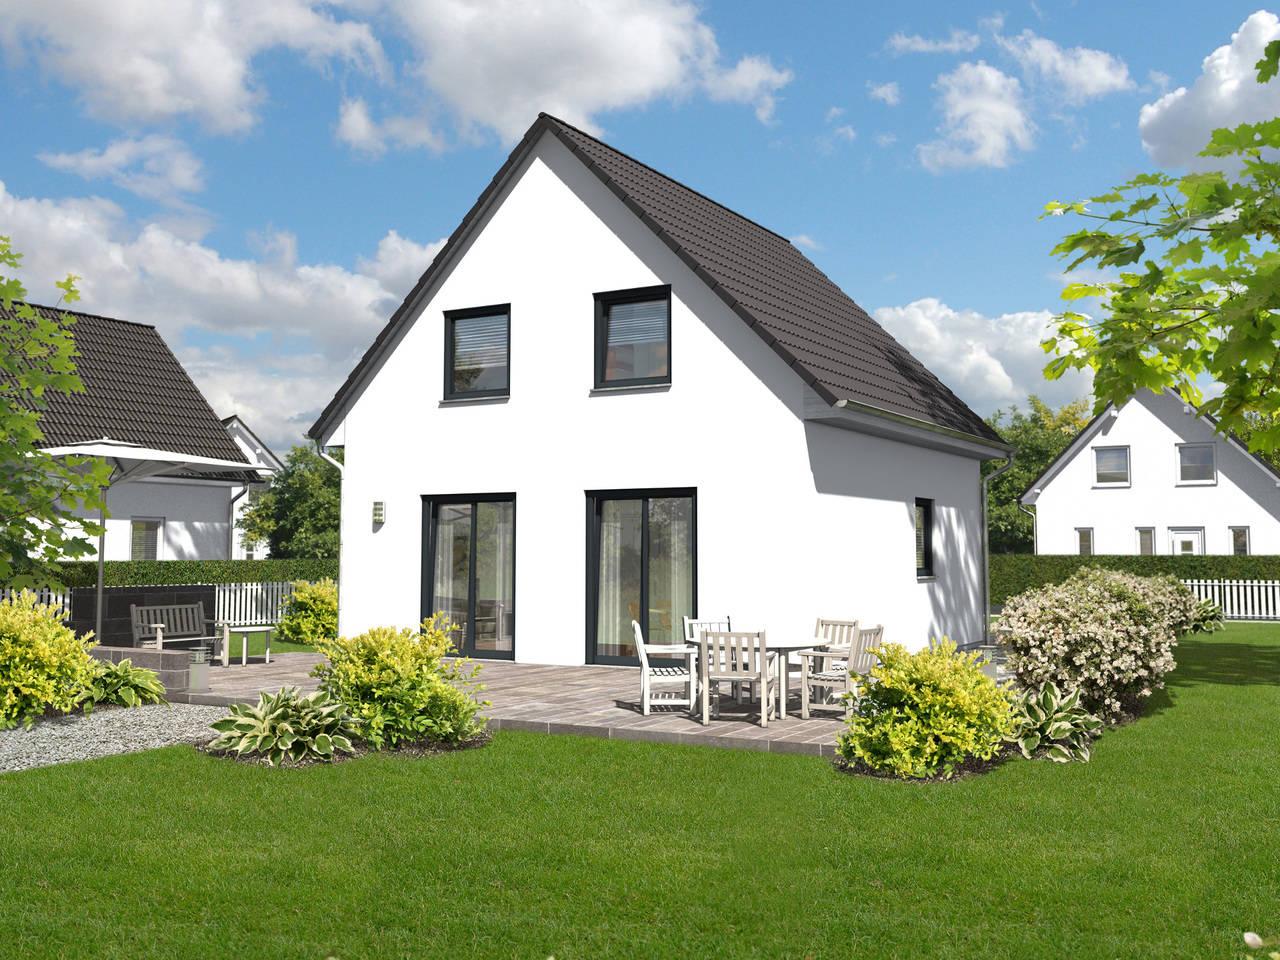 Aspekt 90 A3 von ZuHause Bau GmbH - Town & Country